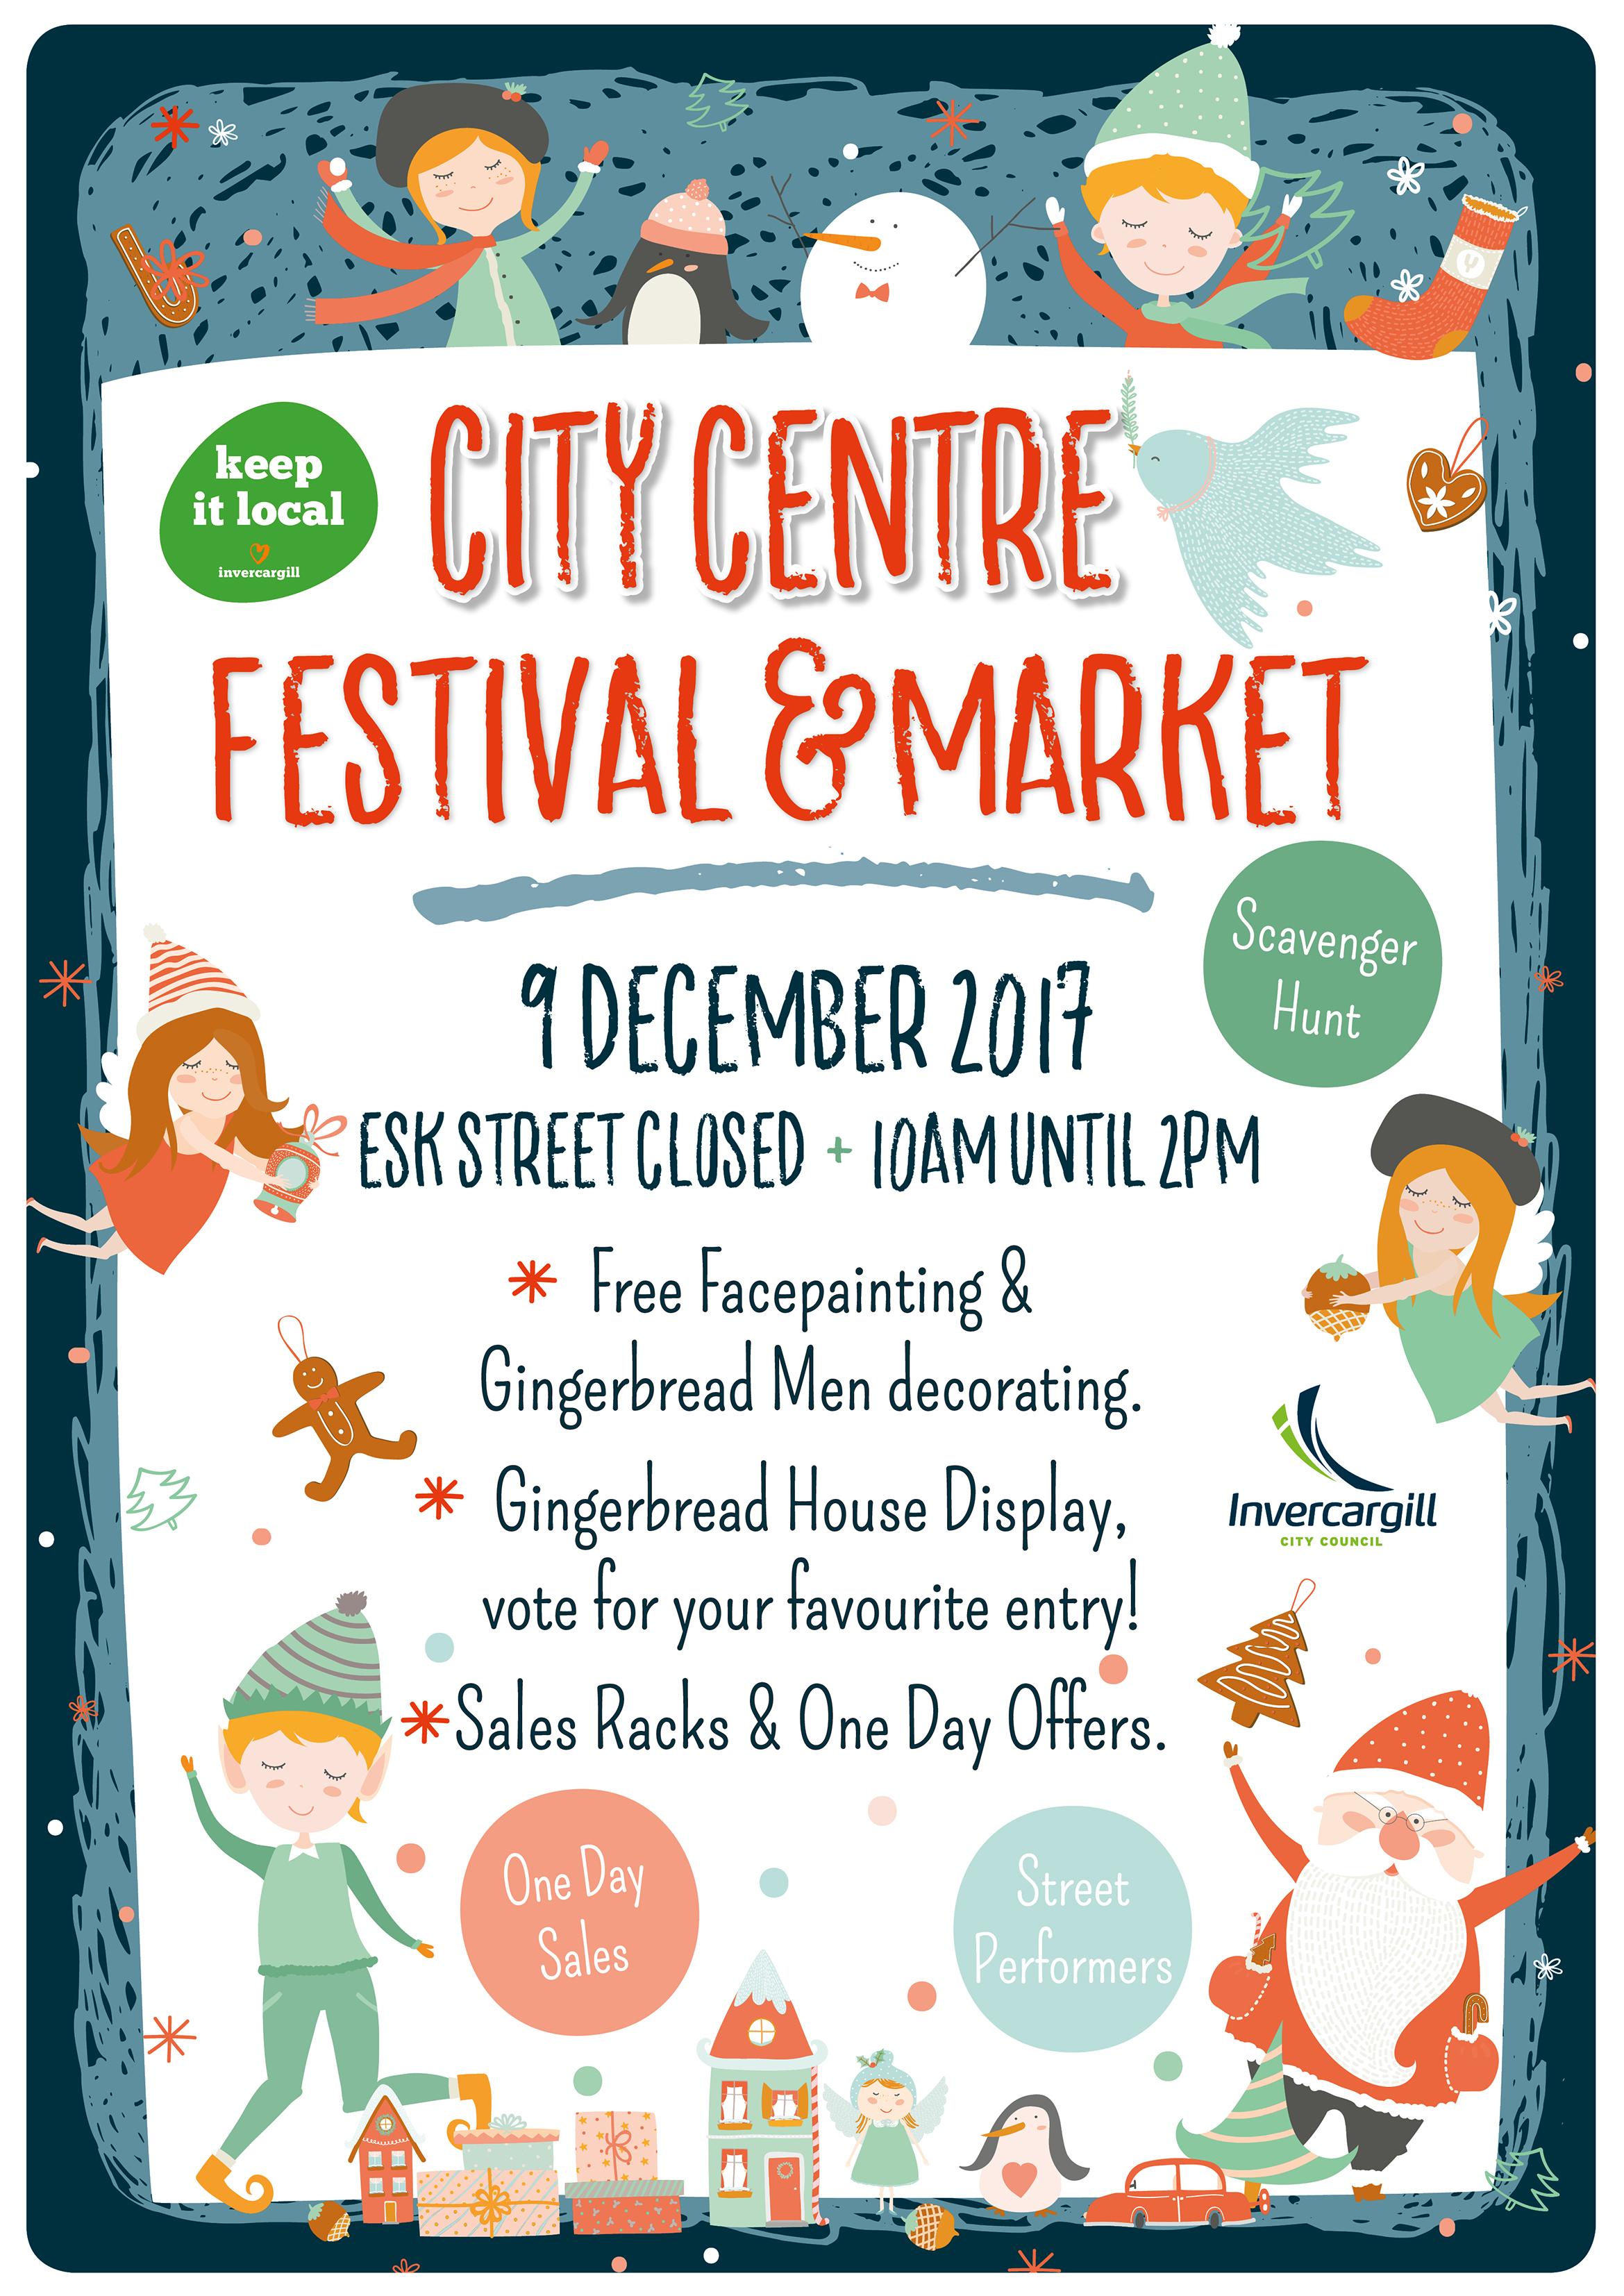 city centre festival and market